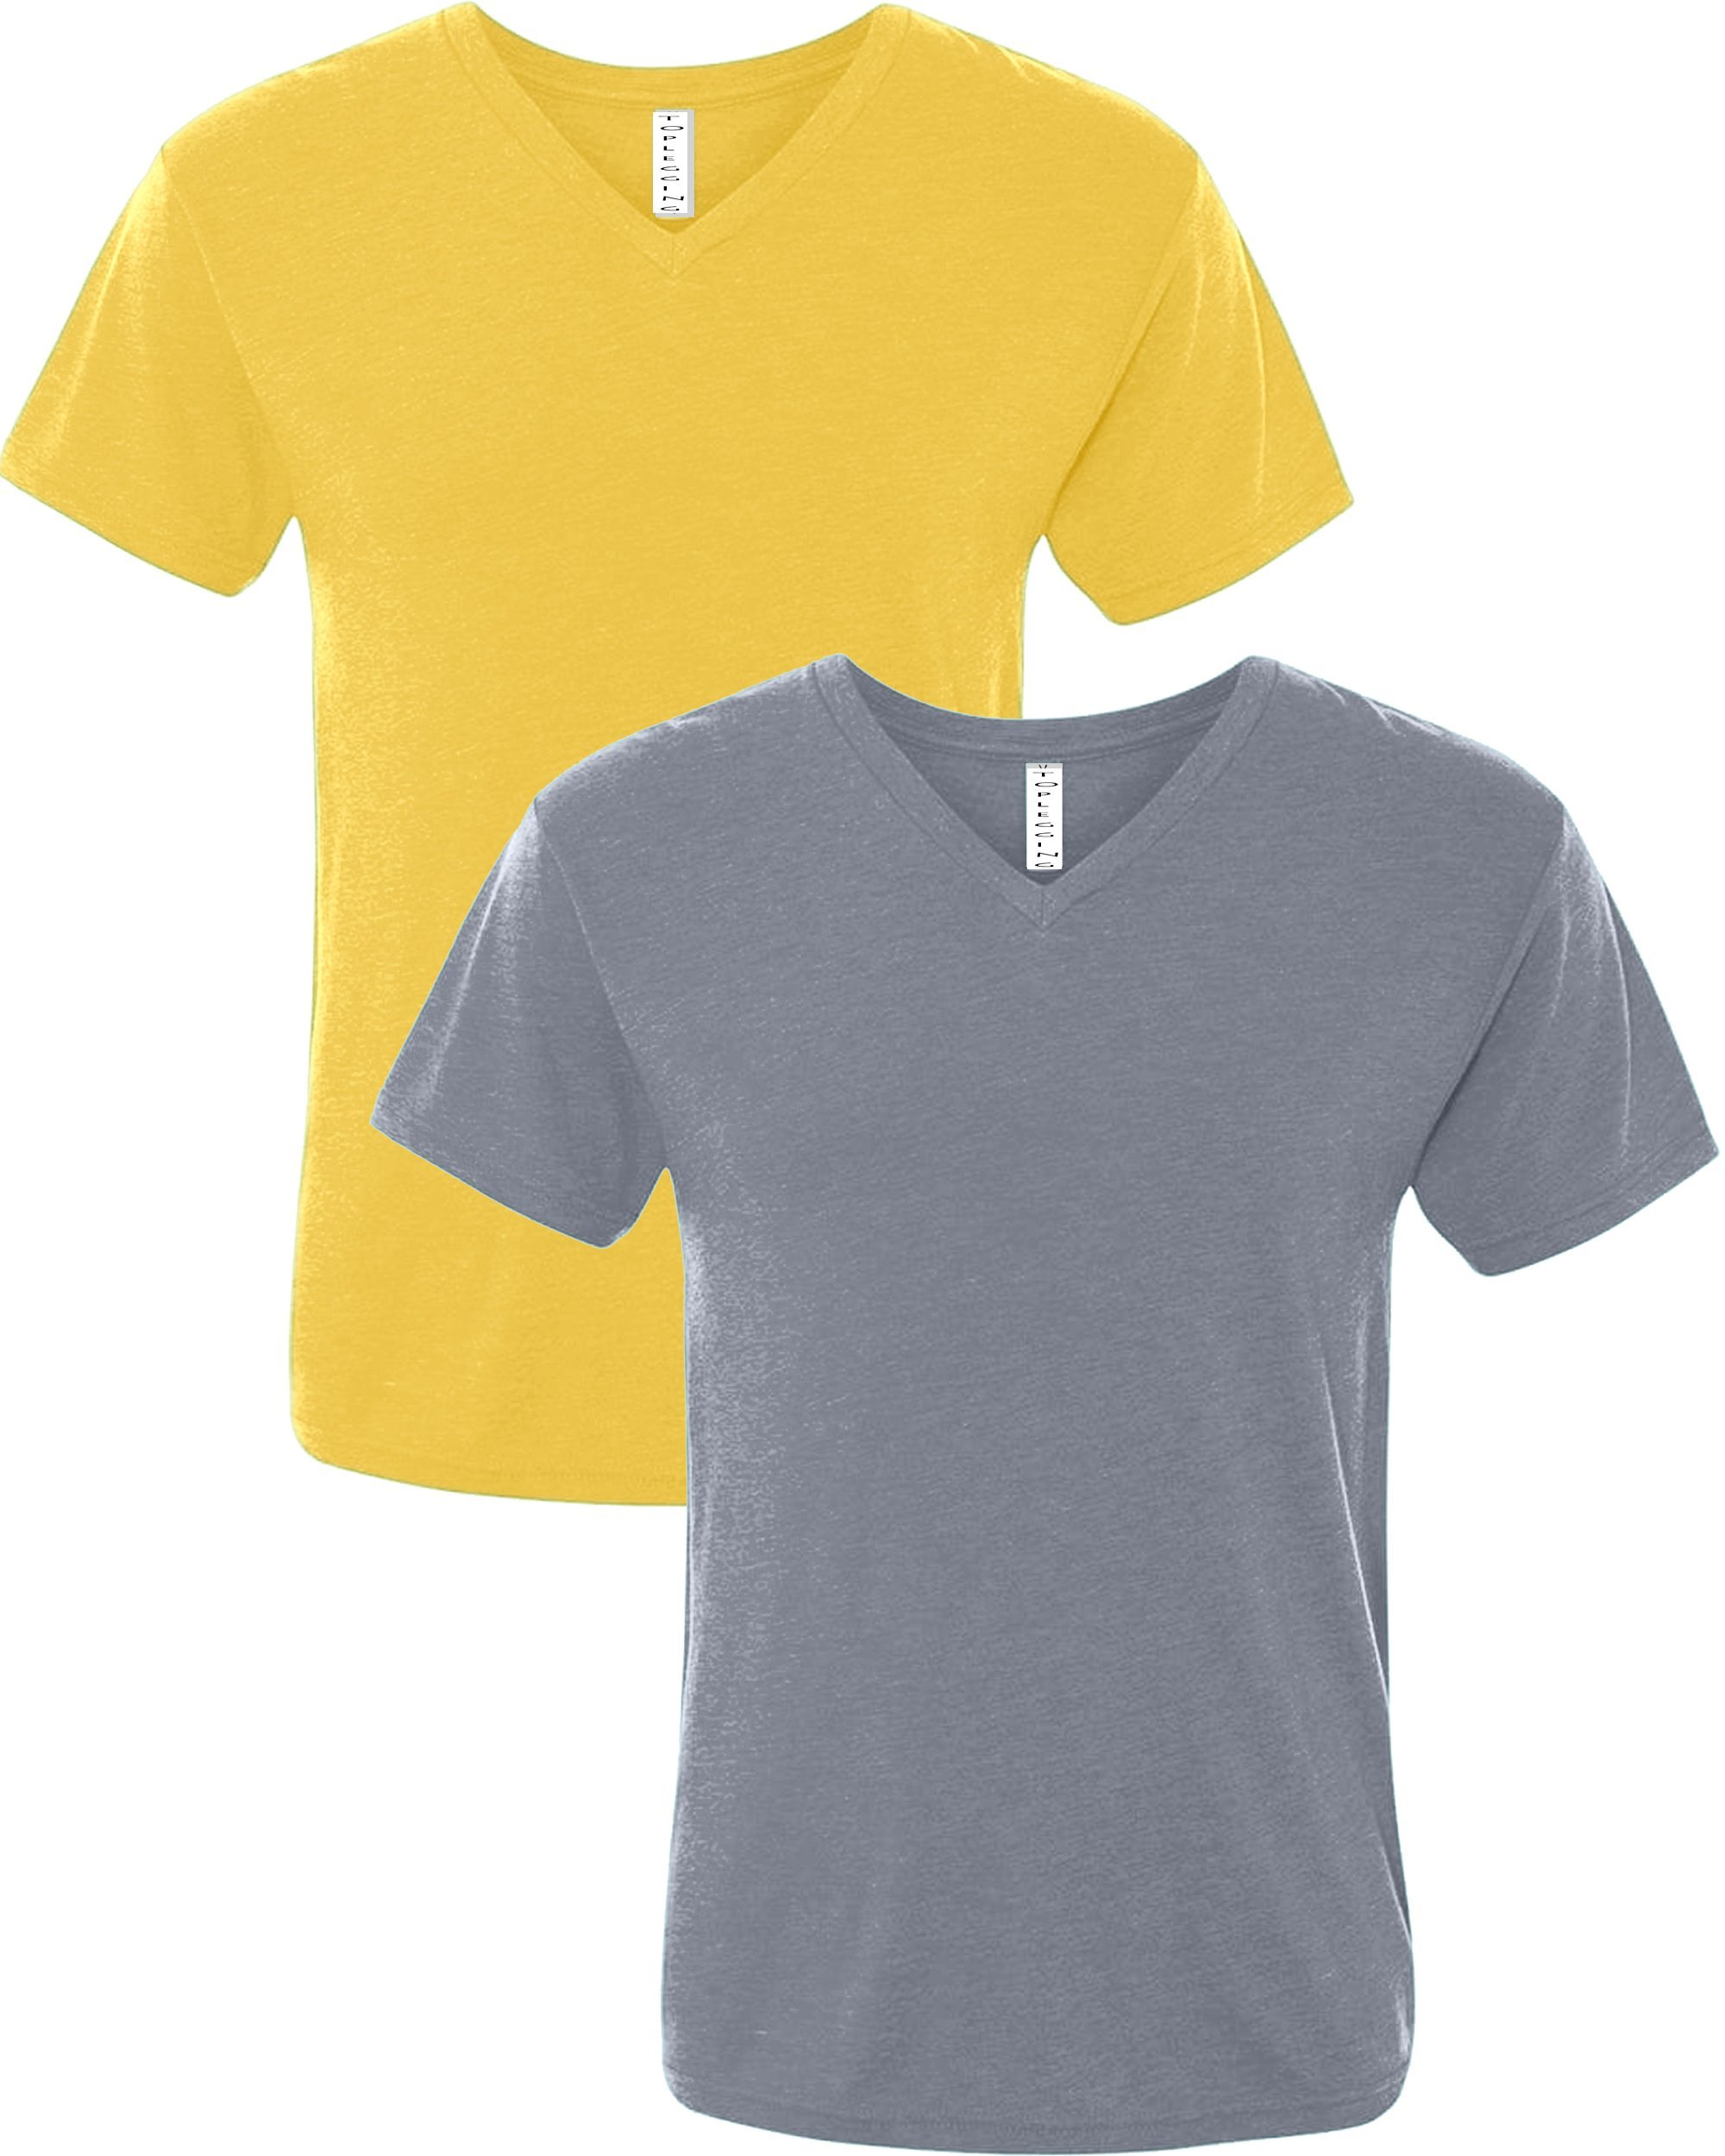 TOP LEGGING TL Men Casual Basic Short Sleeve Tri-Blend/100% Cotton V-Neck T Shirt HVNKSET2_HMUS_HDENIM XL